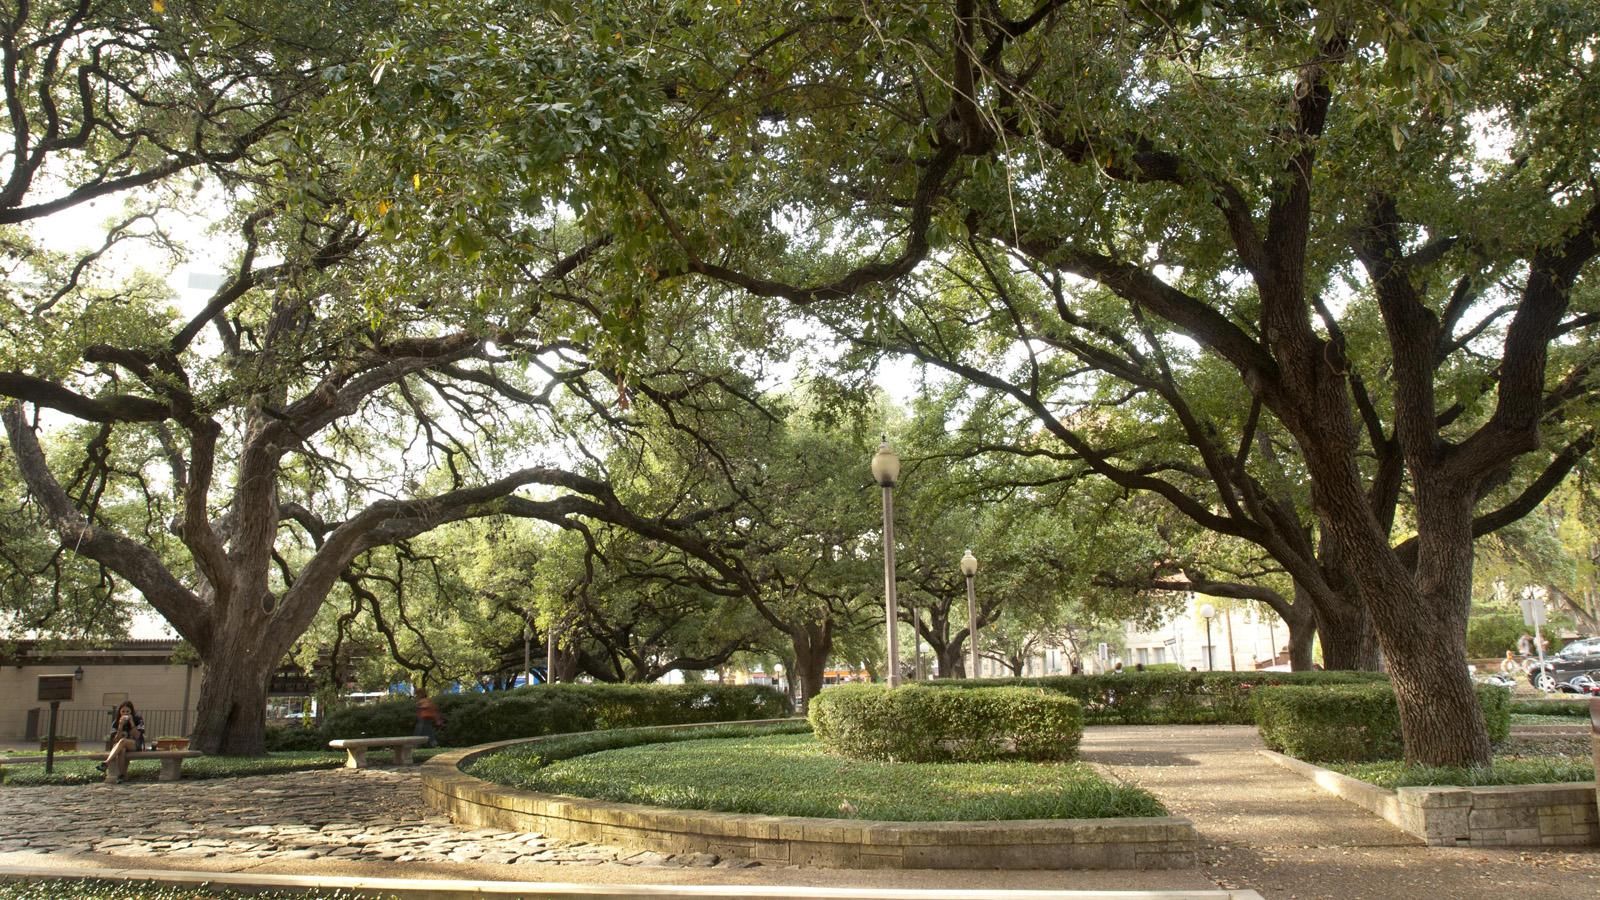 TX_Austin_UniversityofTexas_signature_MarshaMiller_2007_03.jpg